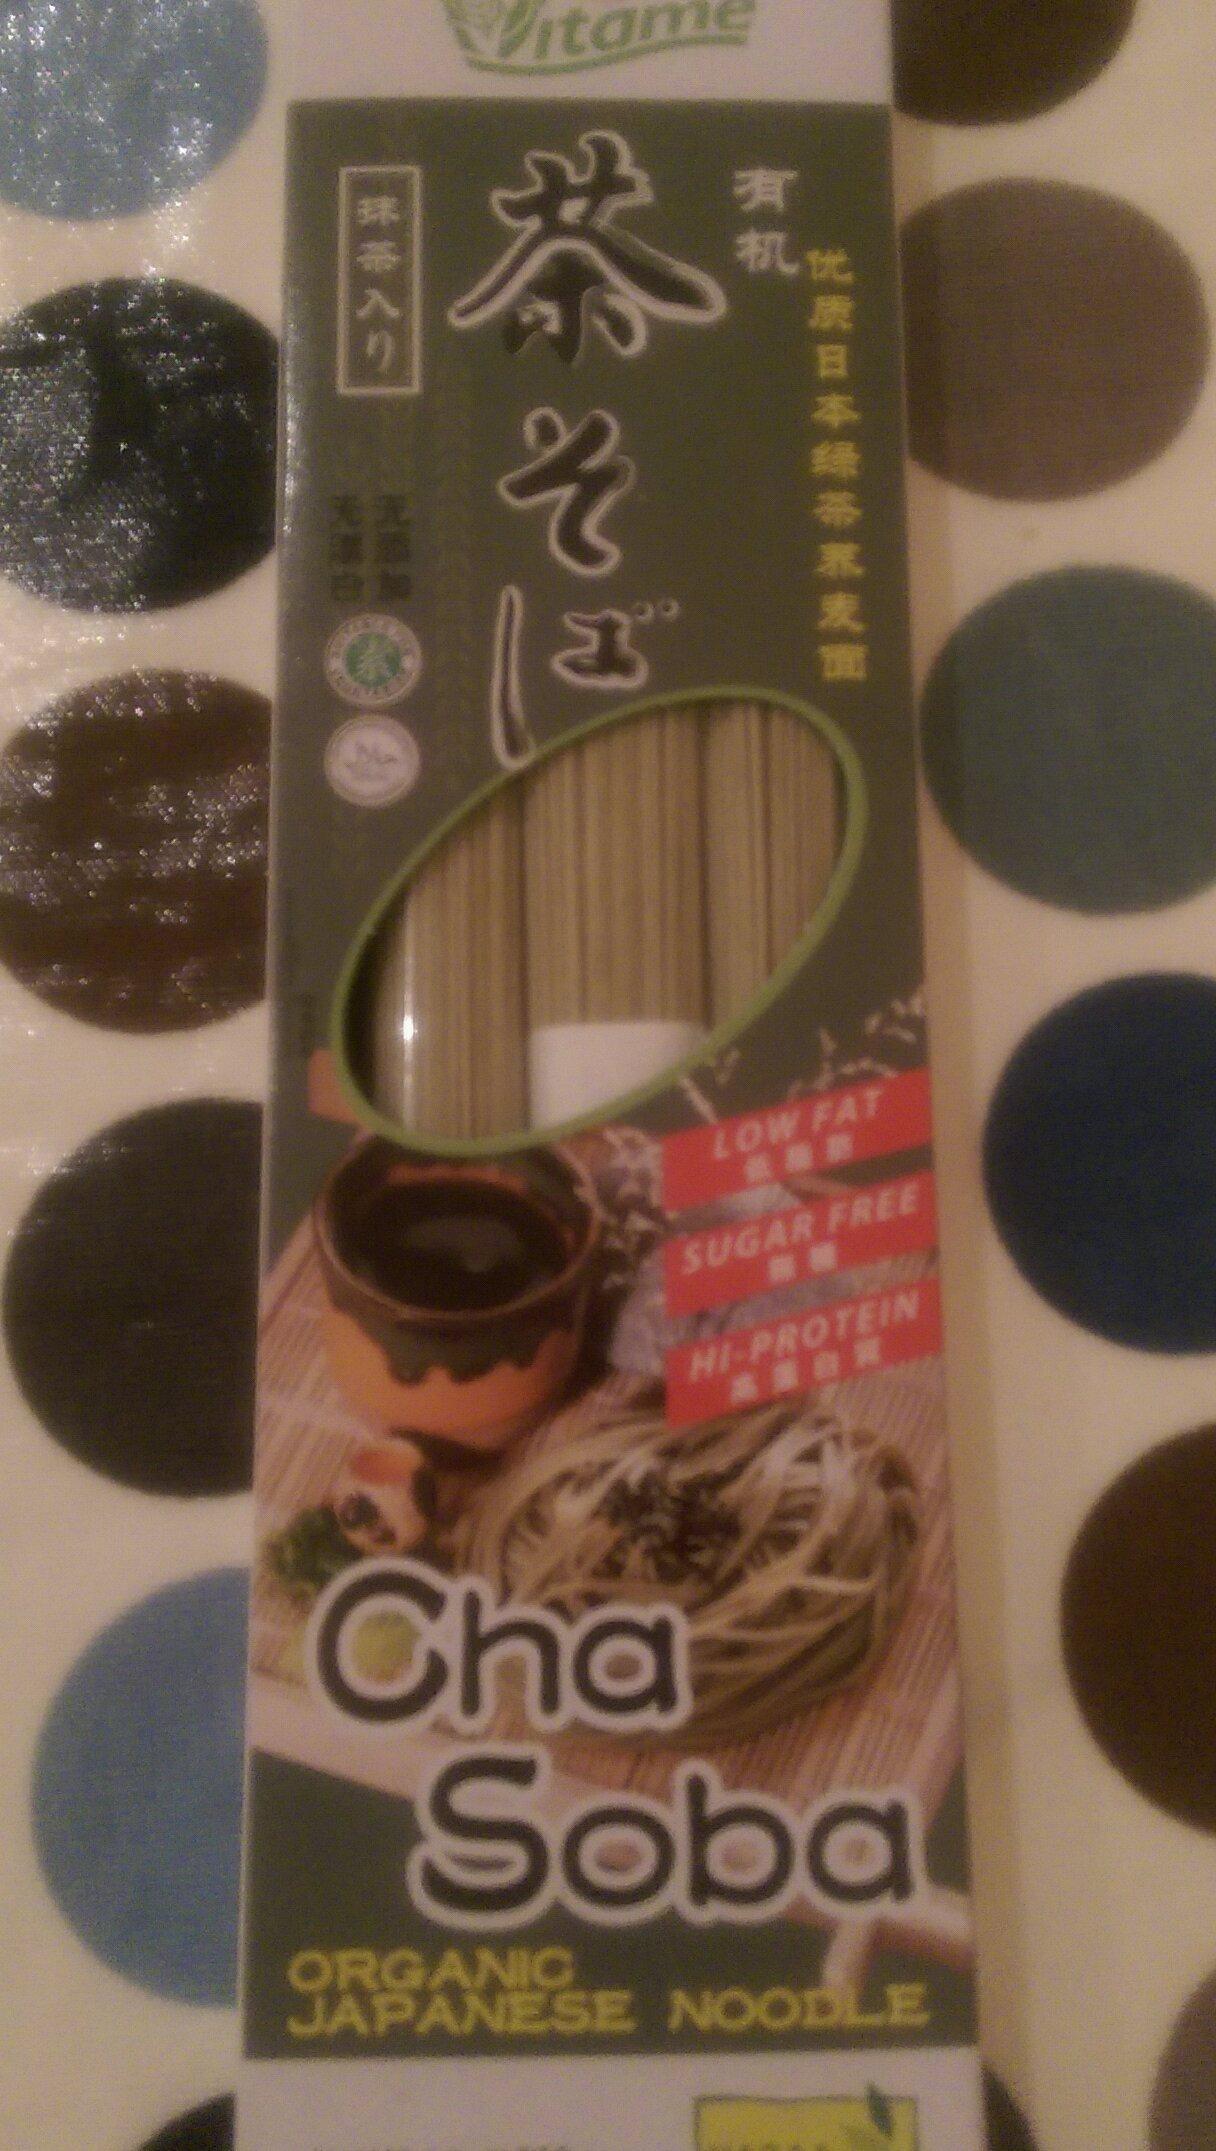 Cha Soba organic Japanese noodles